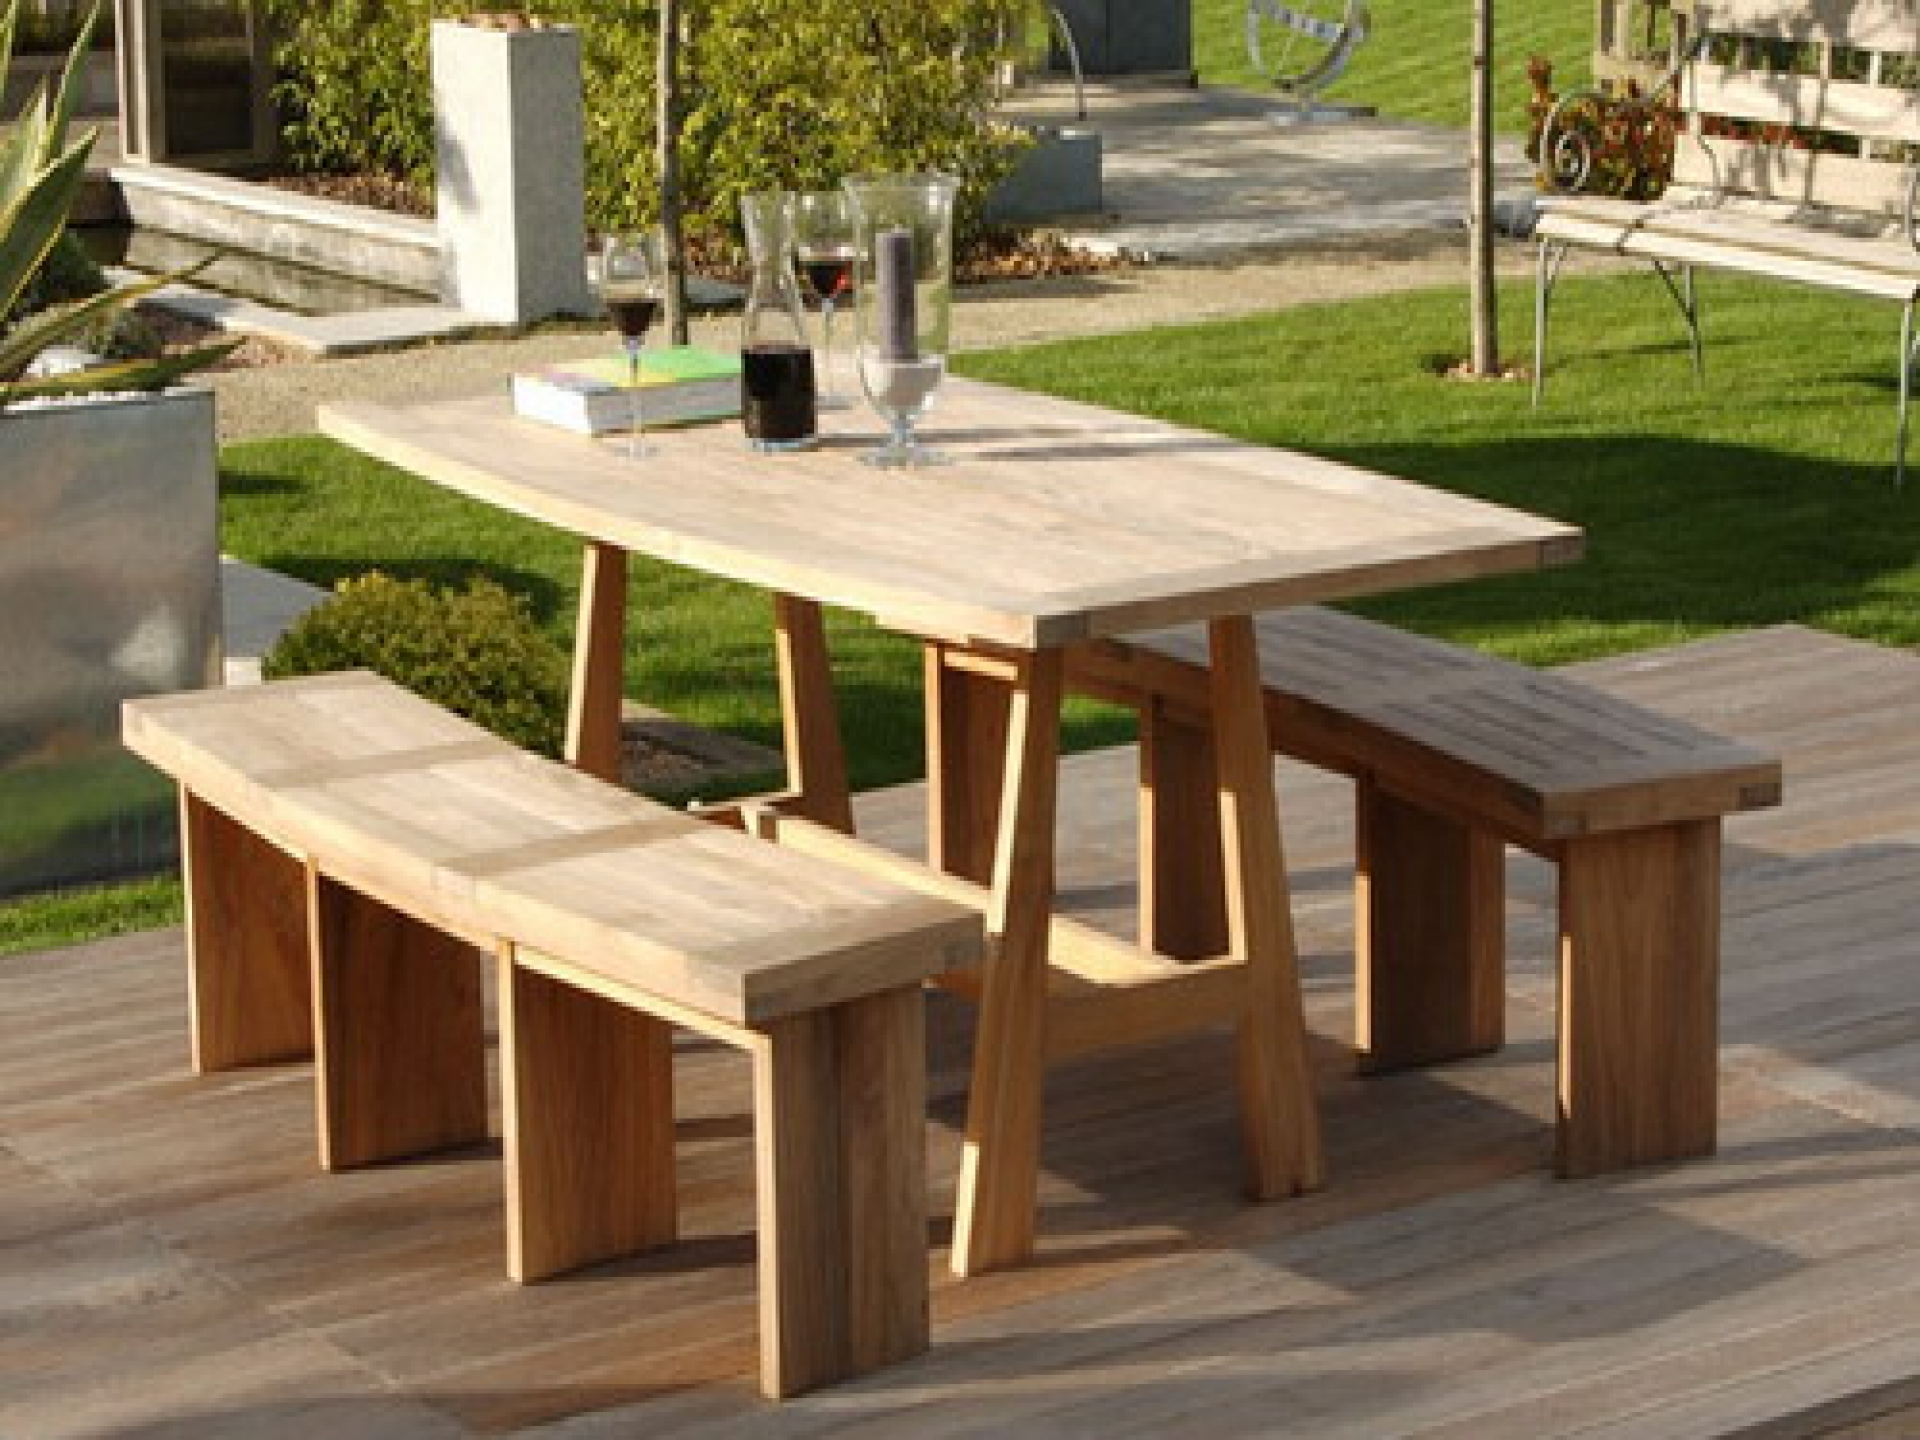 wooden garden furniture pleasant design garden benches home fine decoration patio. round wood  picnic tables UIYKCJS